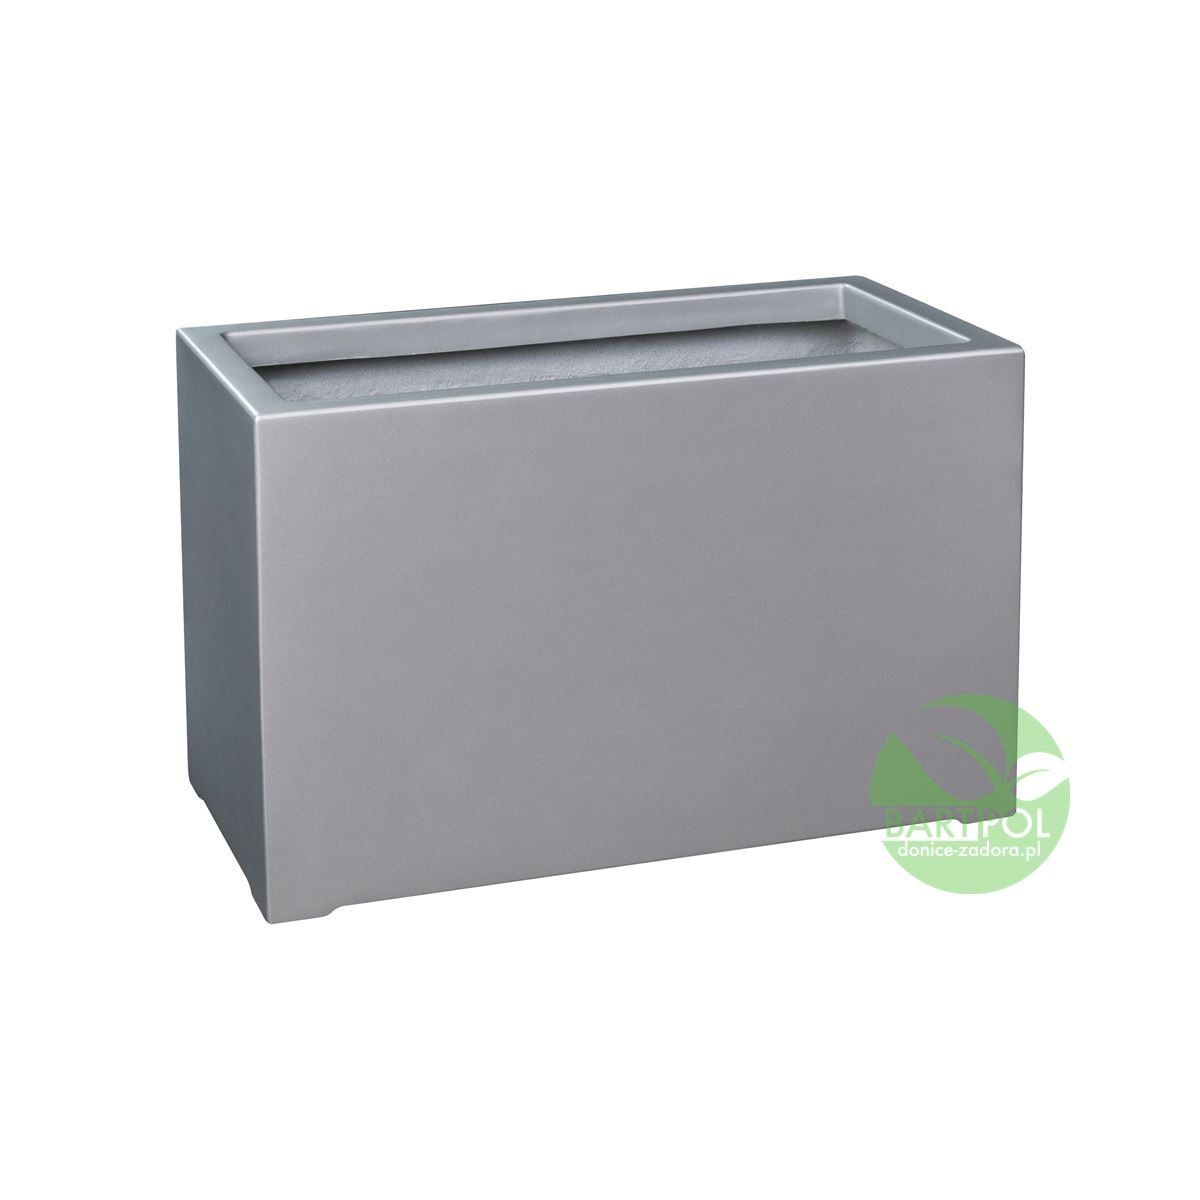 Szara Donica Na Balkon D934a Outdoor Furniture Outdoor Storage Box Outdoor Storage